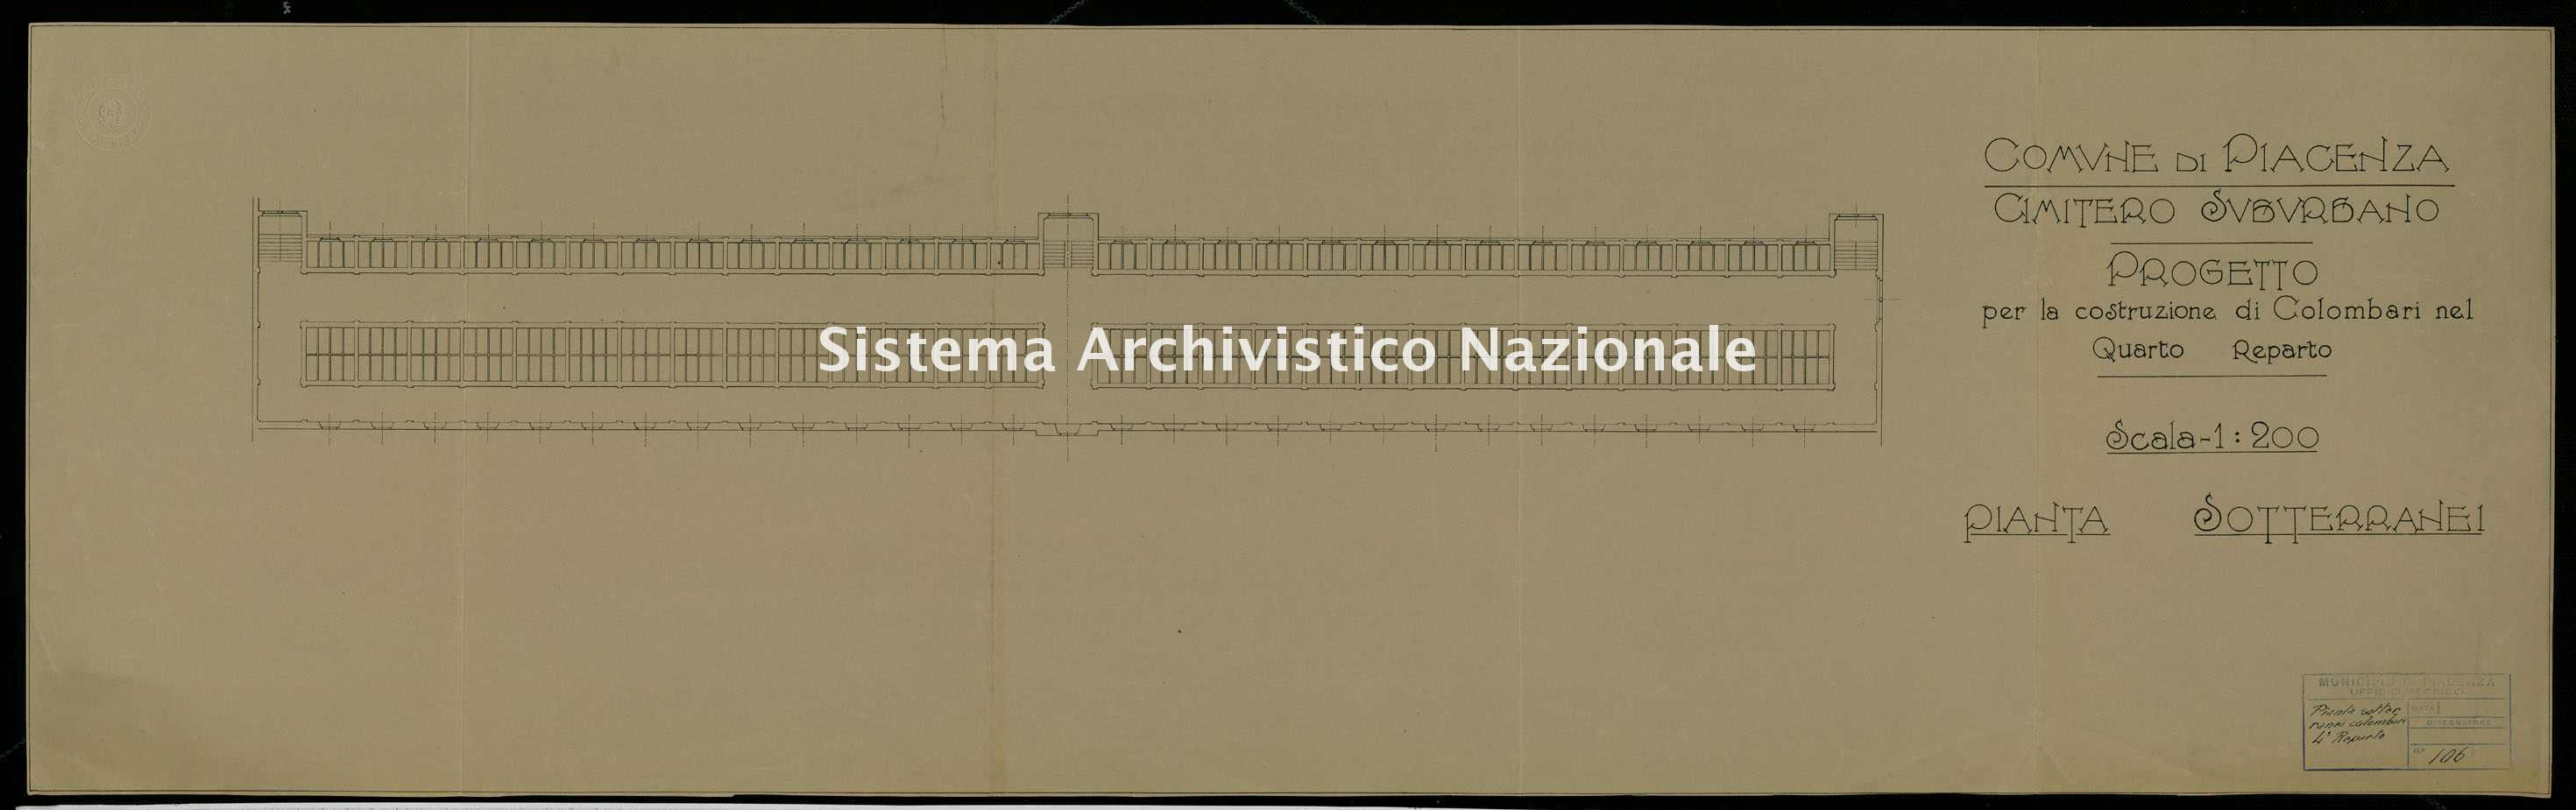 ASPC Mappe, stampe e disegni, n. 5222